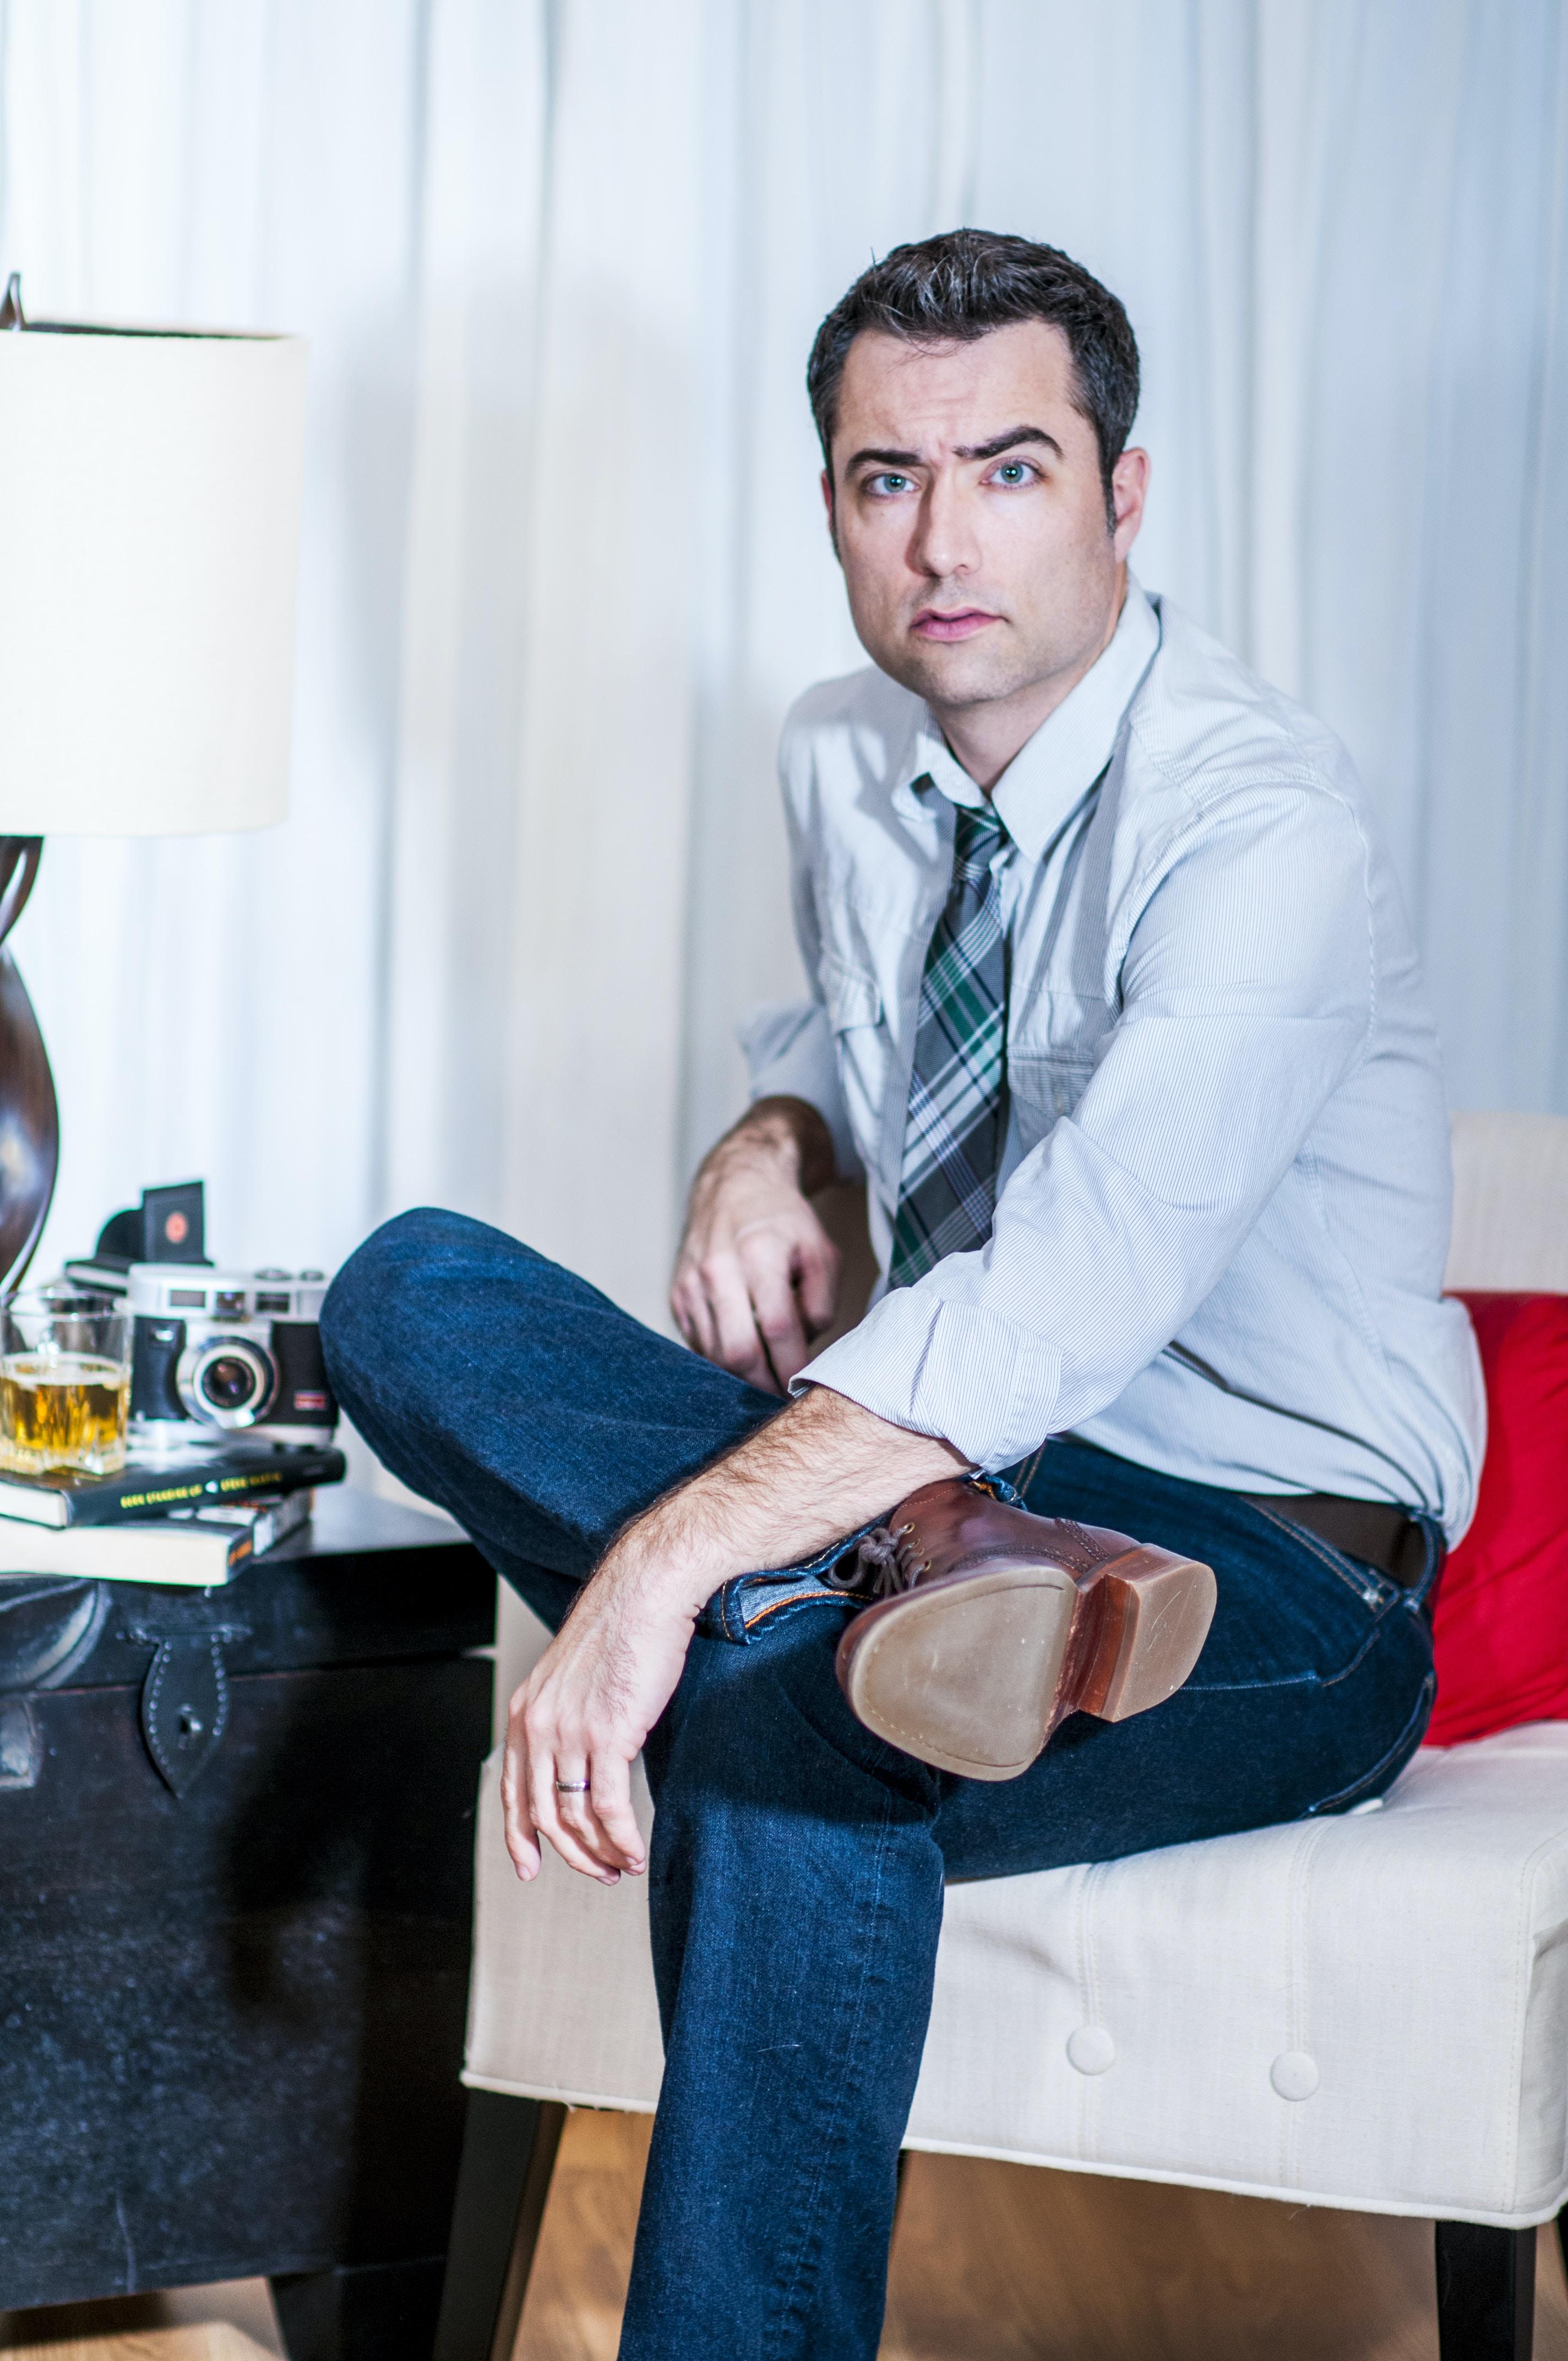 man cross-legged sitting on padded sofa chair